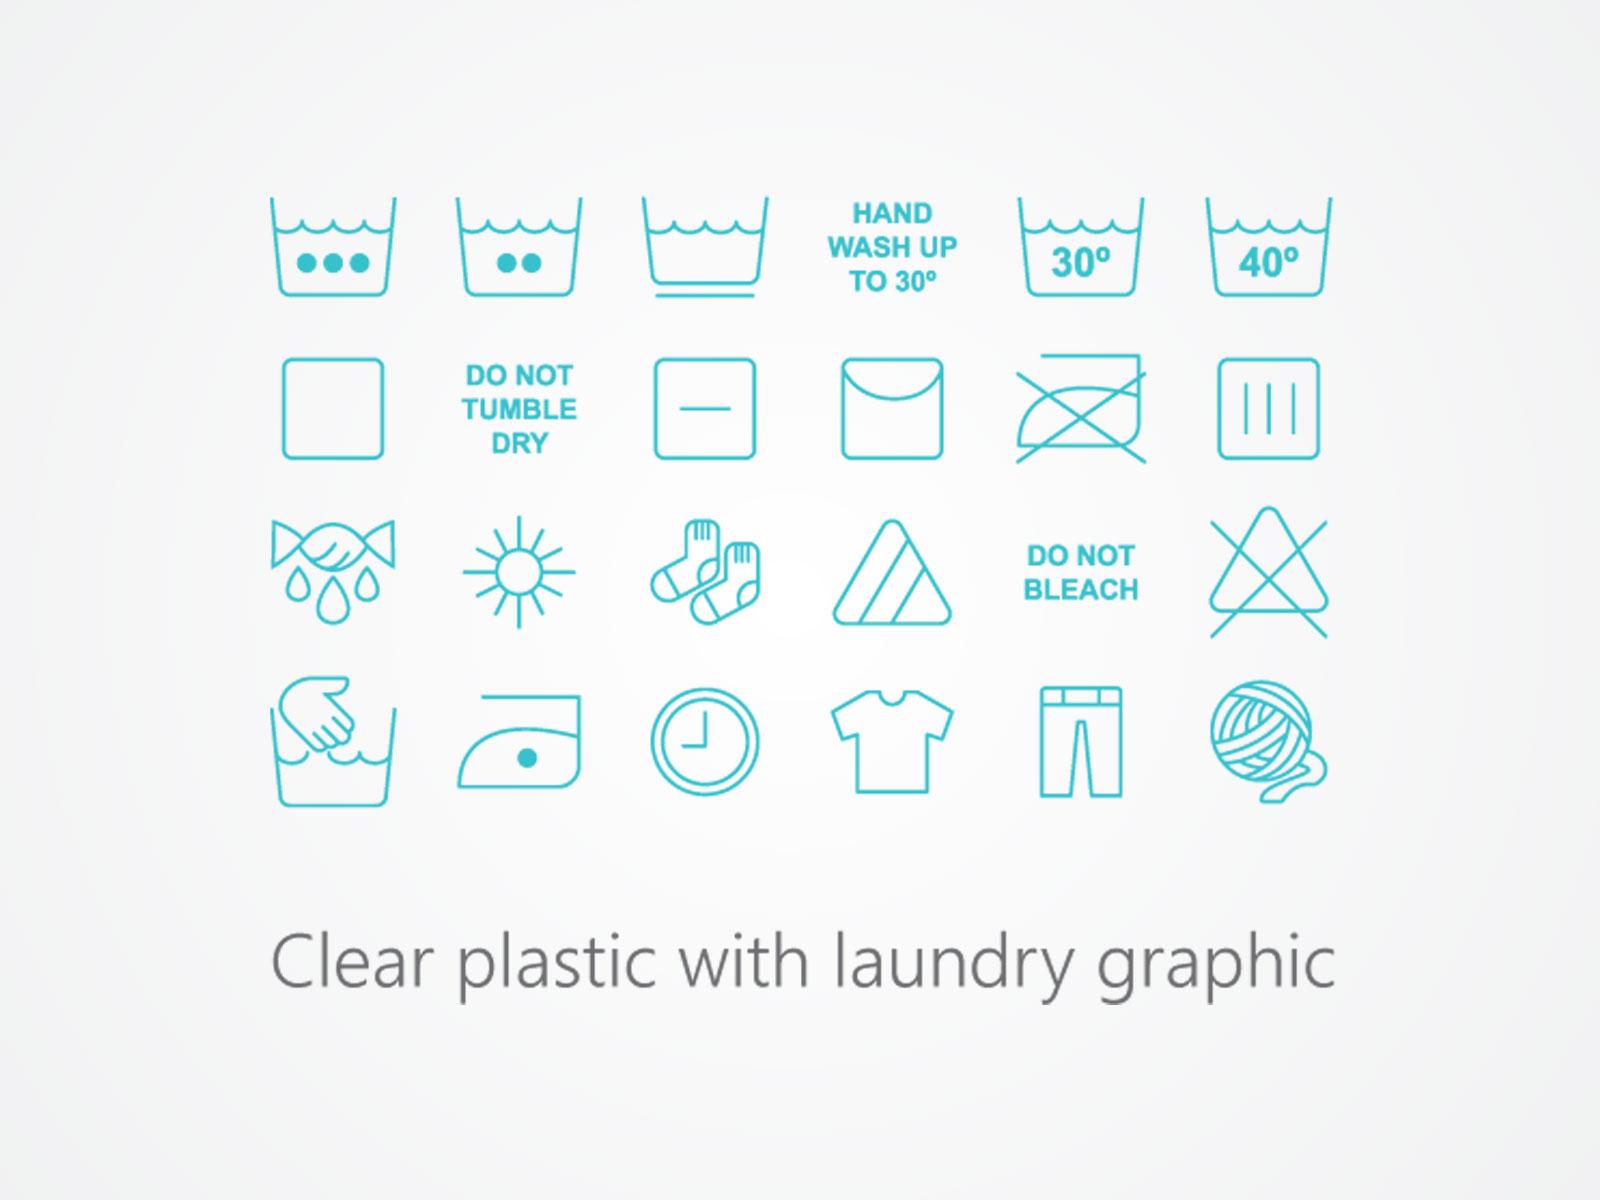 Laundry graphic